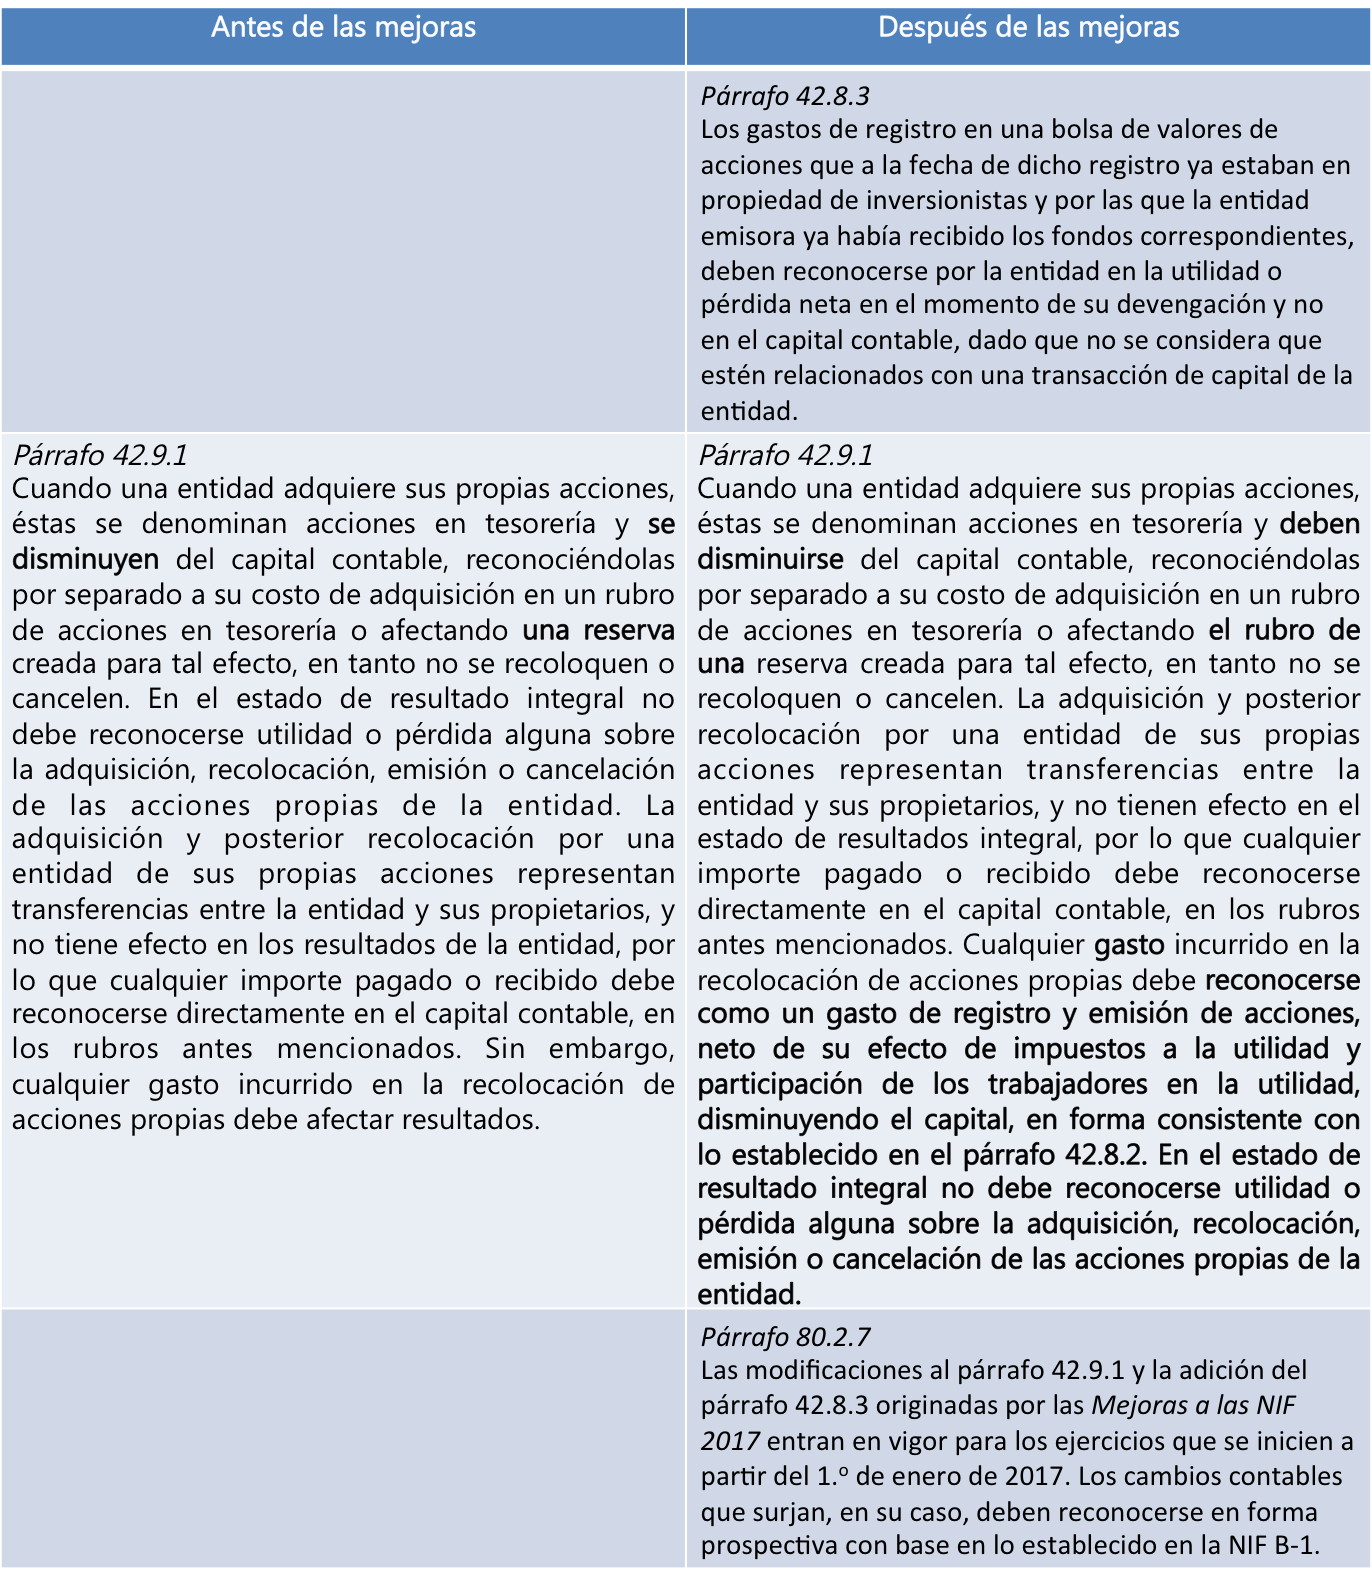 NIF C-11 Capital contable